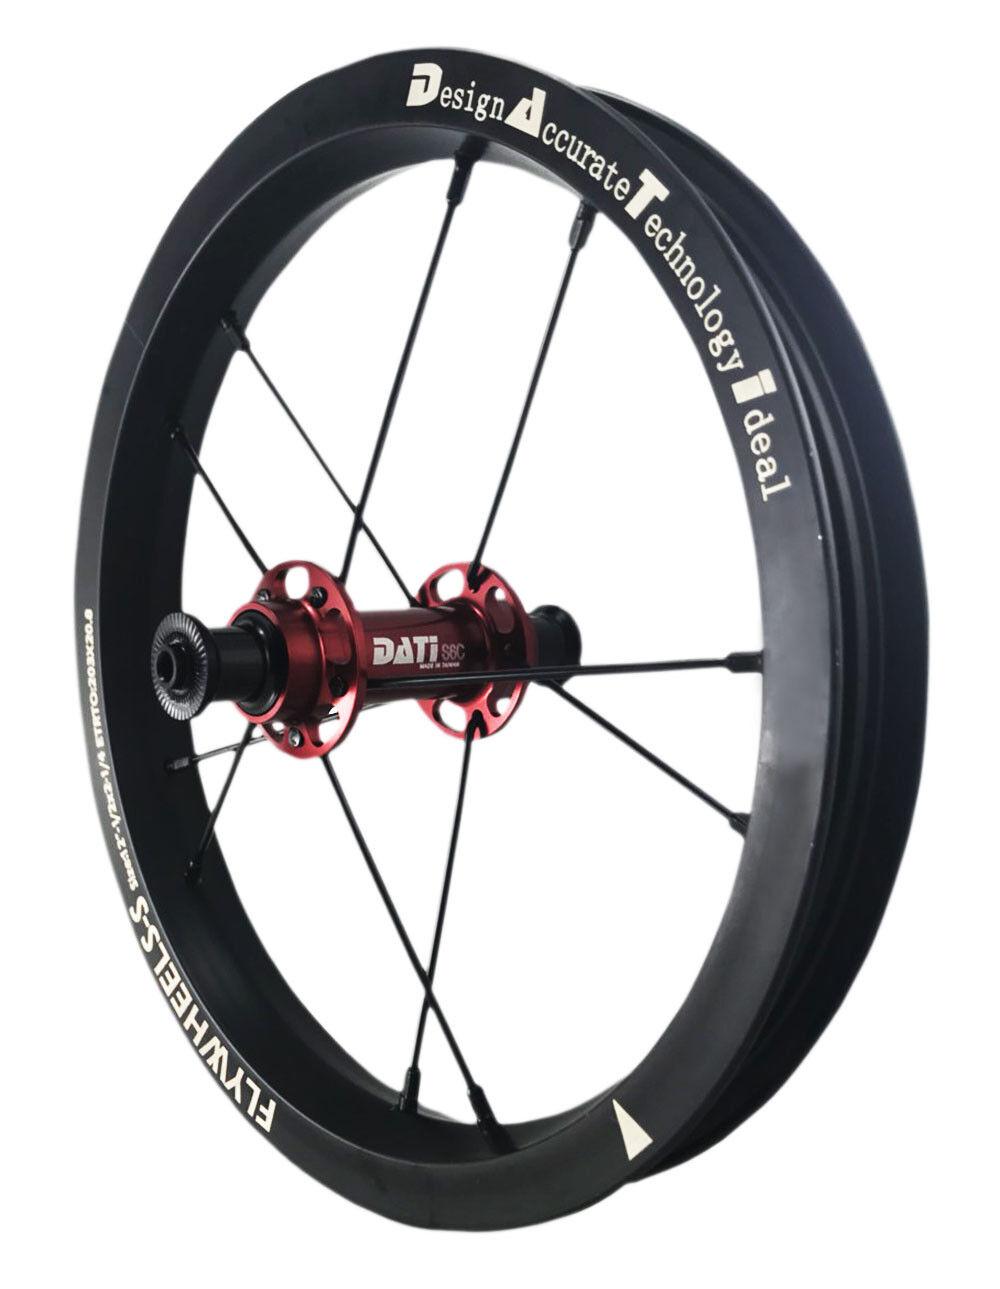 NEW DATI S6C-W  AlloyPush Kids Balance Bike Bicycle Super light  wheels Set 12